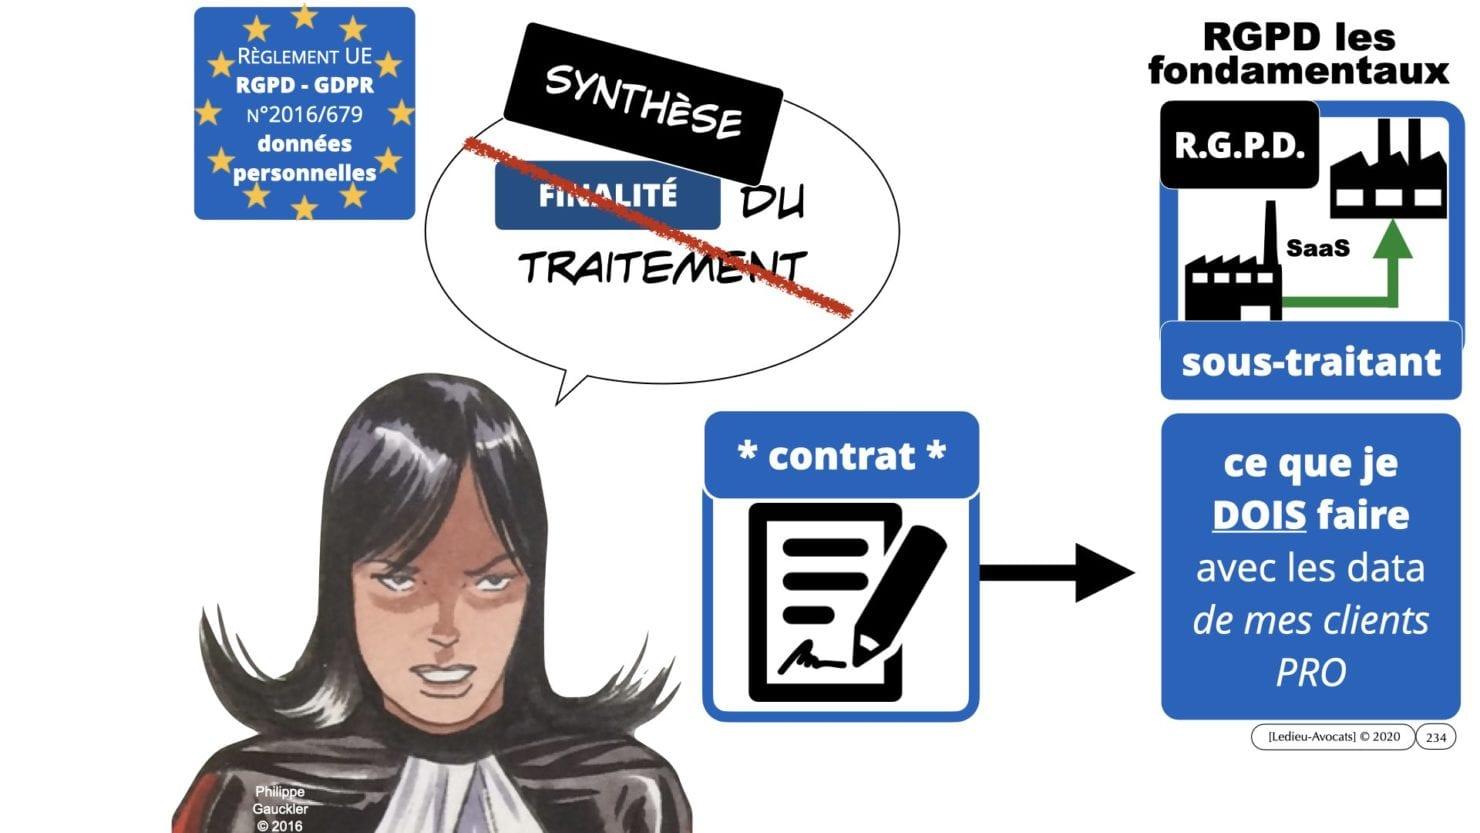 RGPD e-Privacy principes actualité jurisprudence ©Ledieu-Avocats 25-06-2021.234